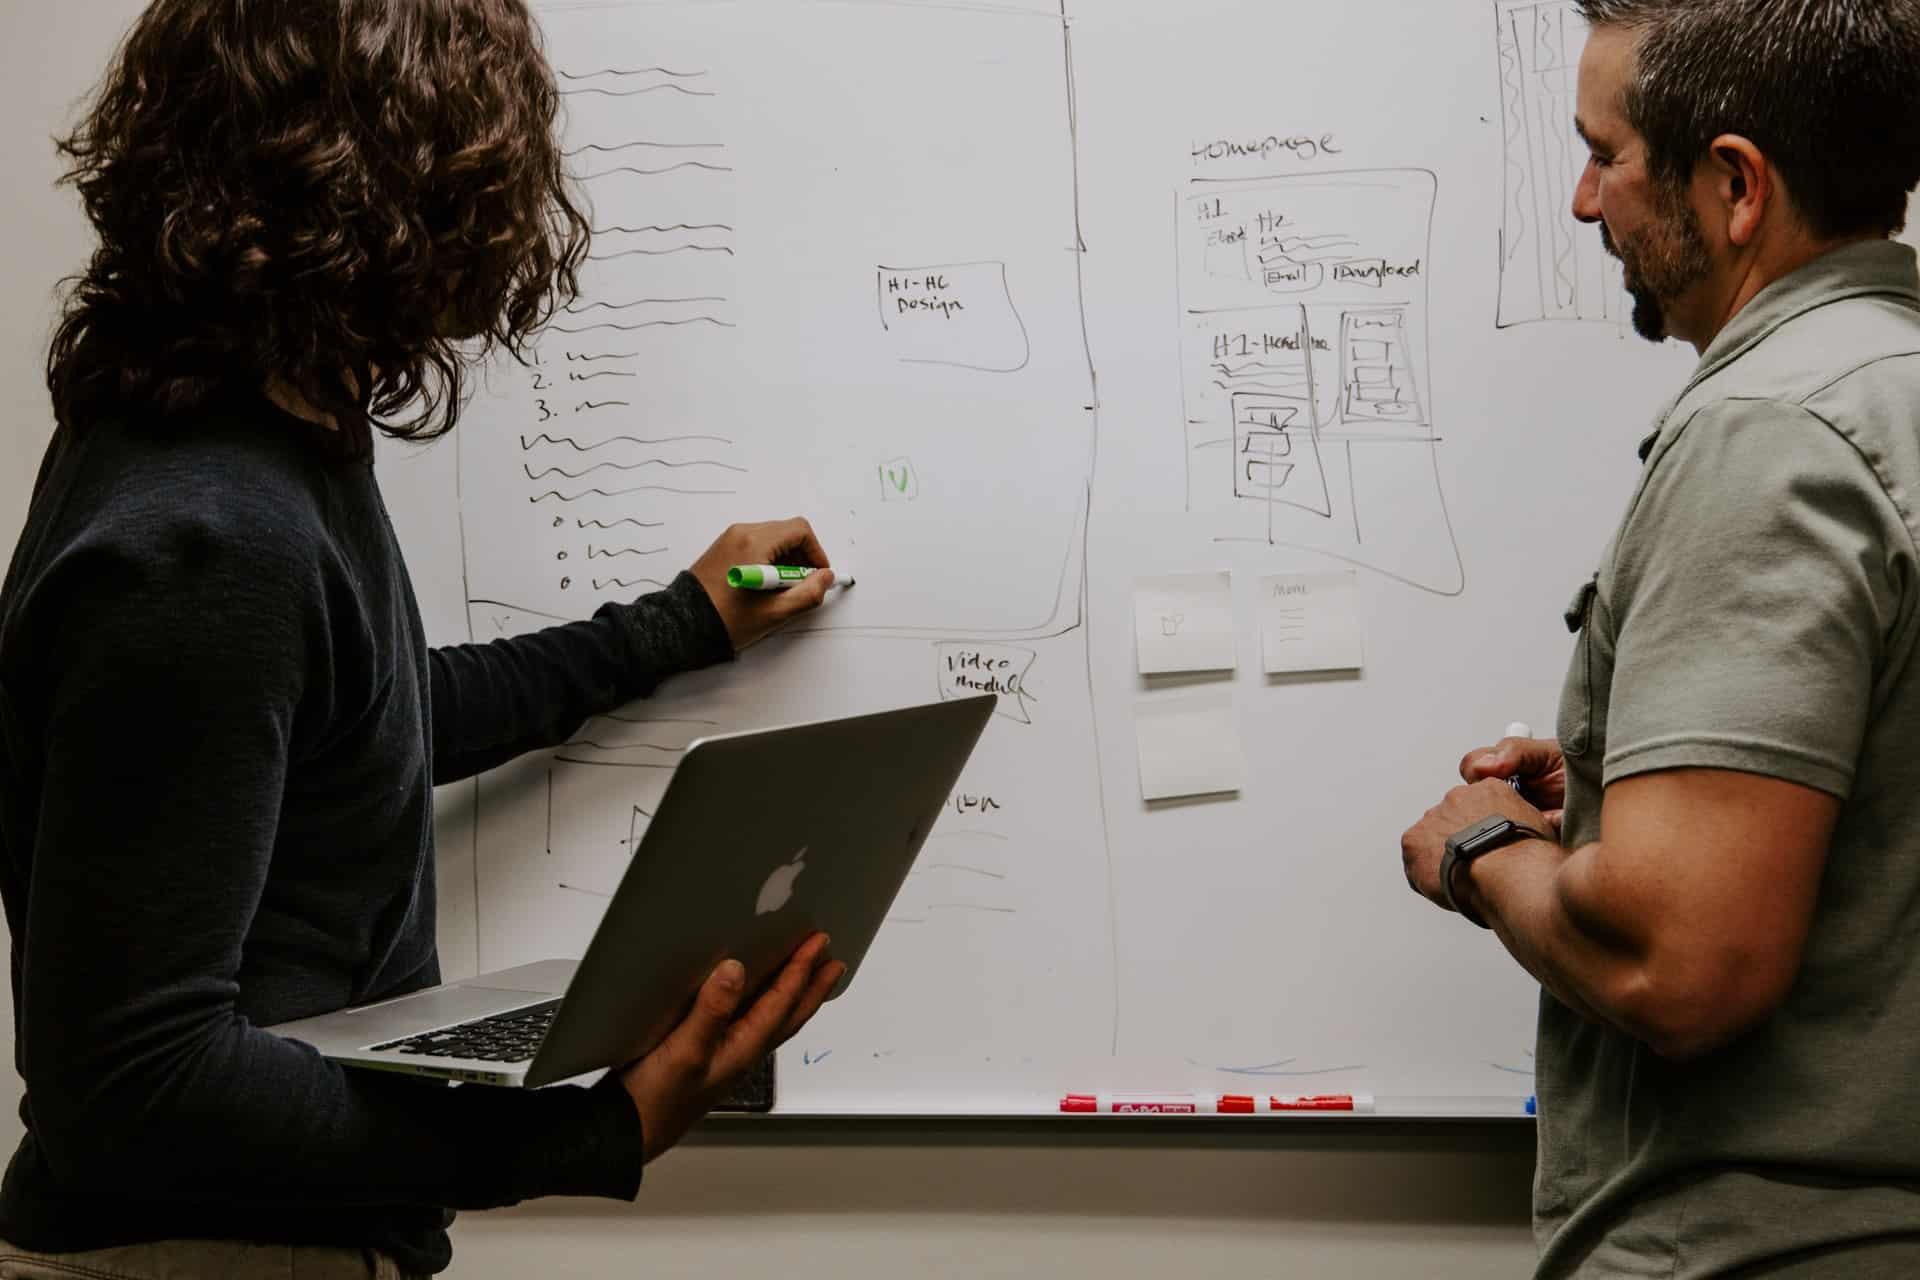 Two men planning on whiteboard